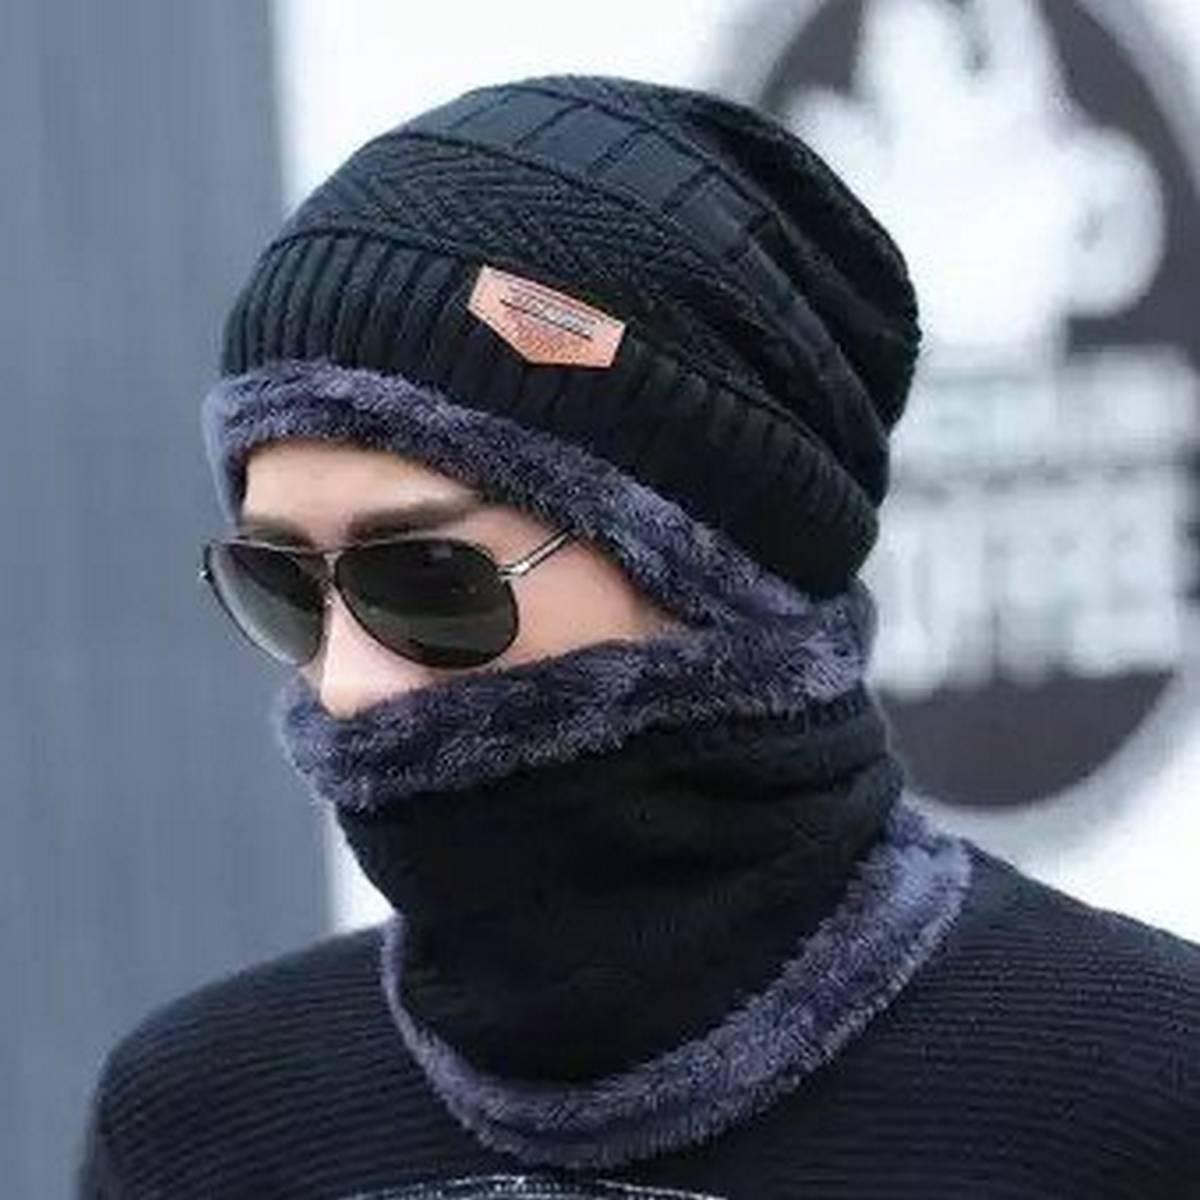 Woolen Winter Cap With Neck Band For Kid, Men and Women